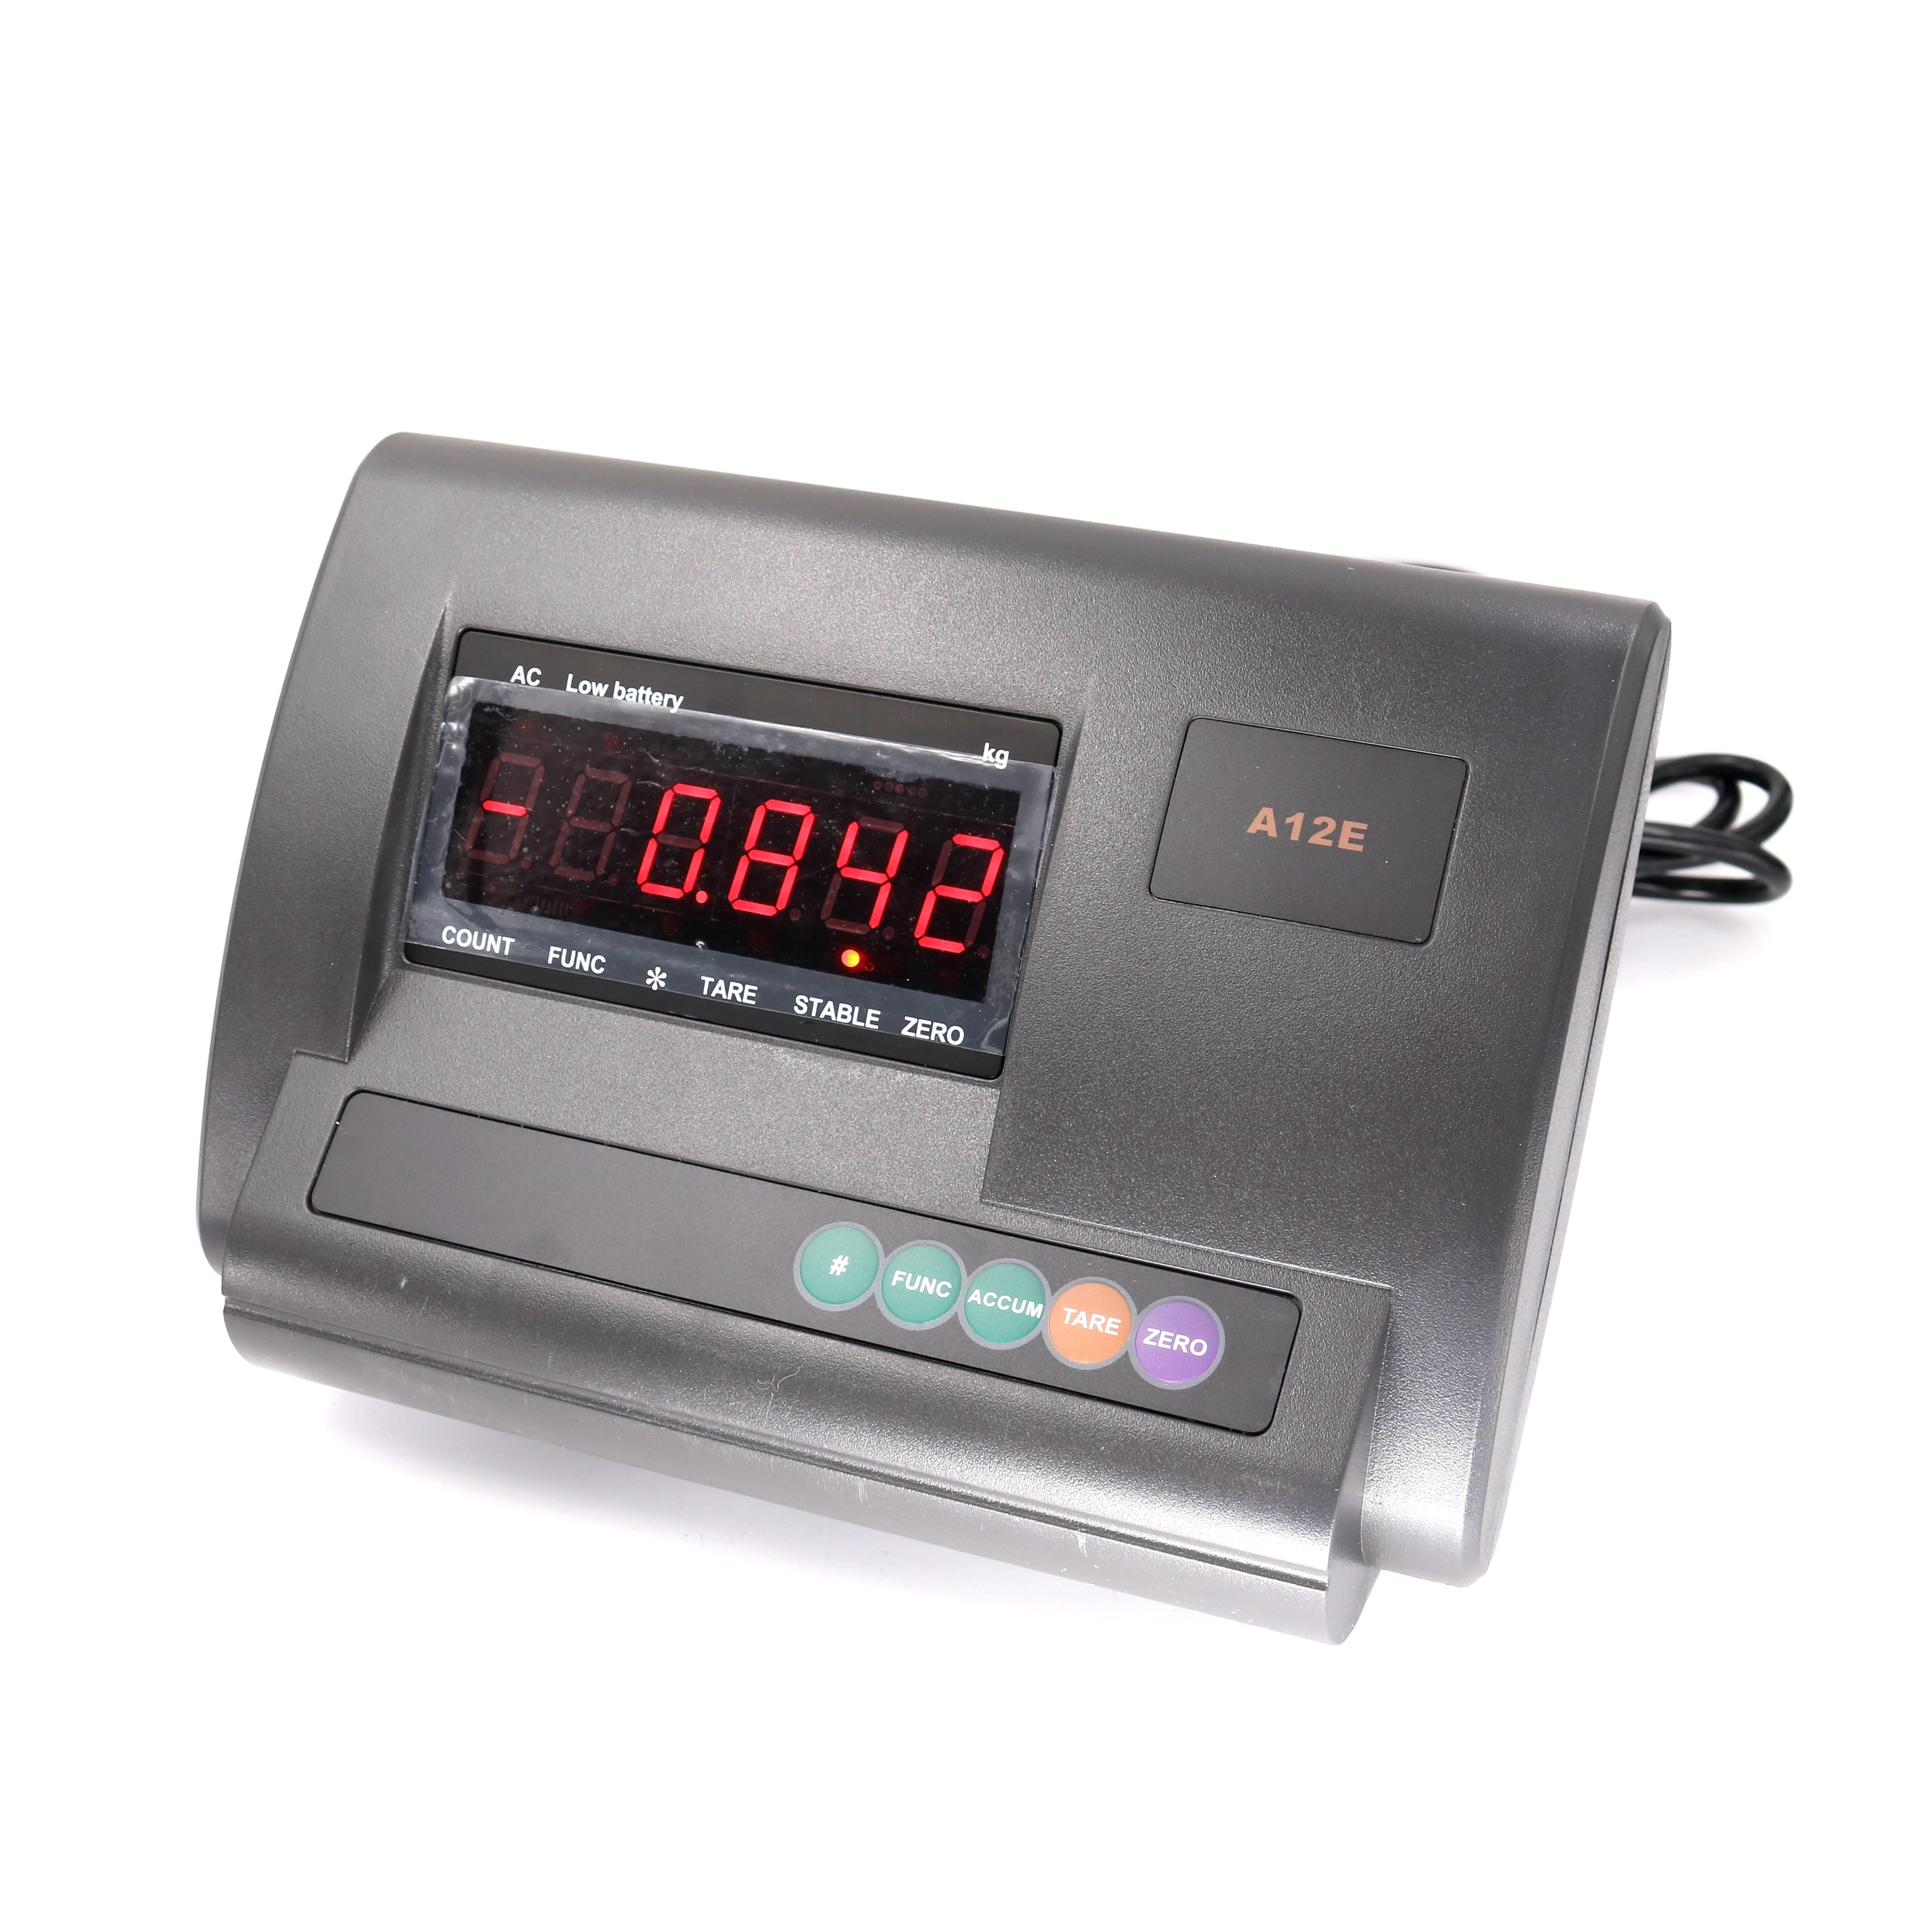 XK3190 A12E платформы шкала английский светодиодный Дисплей панели Вес indicatorload метр контроллер loadometer Вес метр модуль